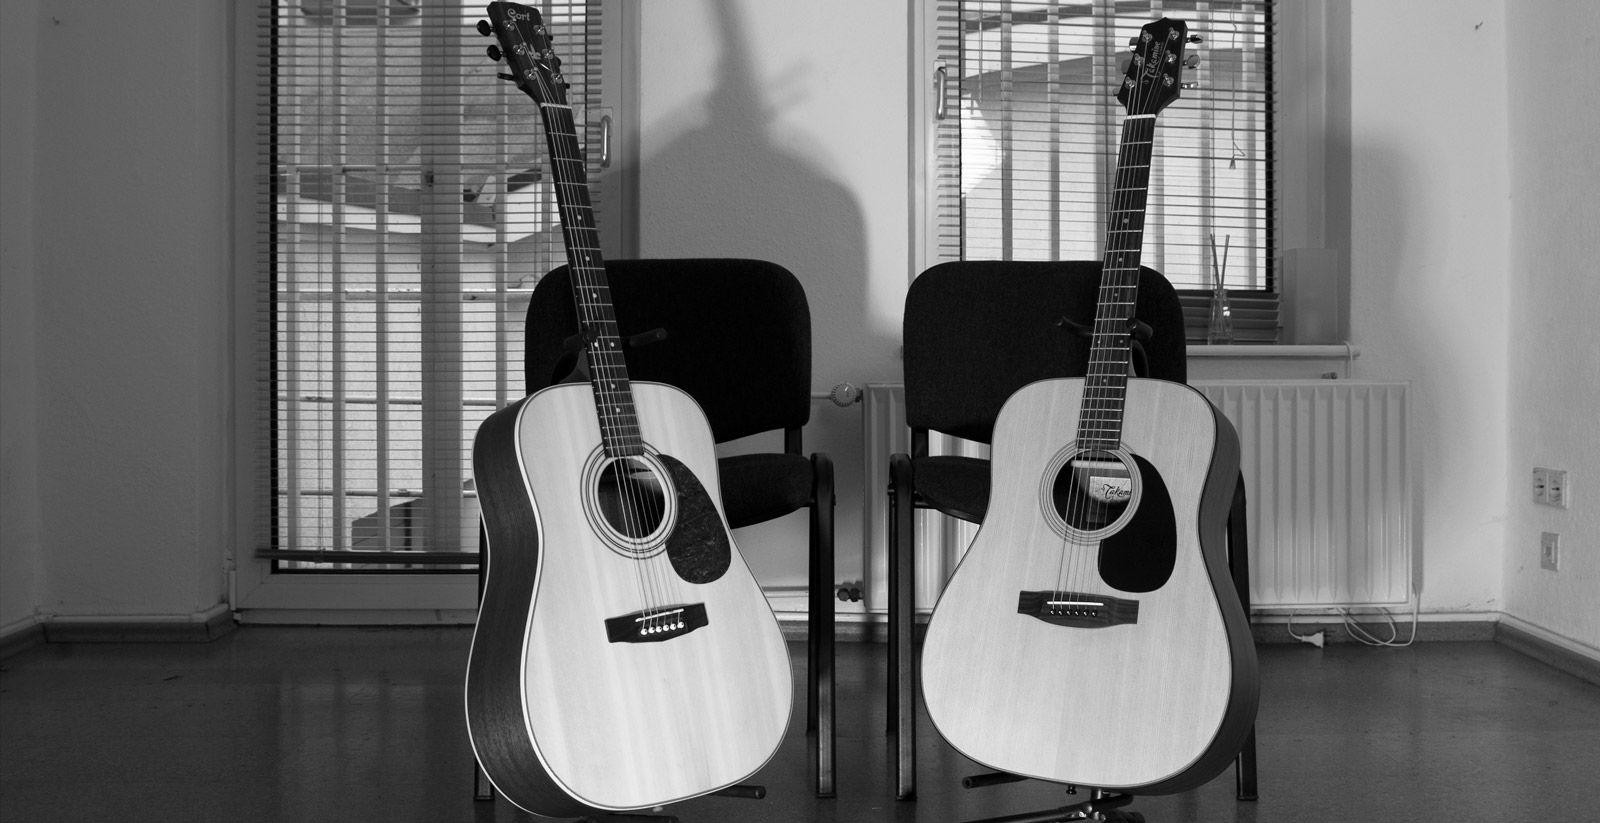 the-guitar-school-tandem-slide-008